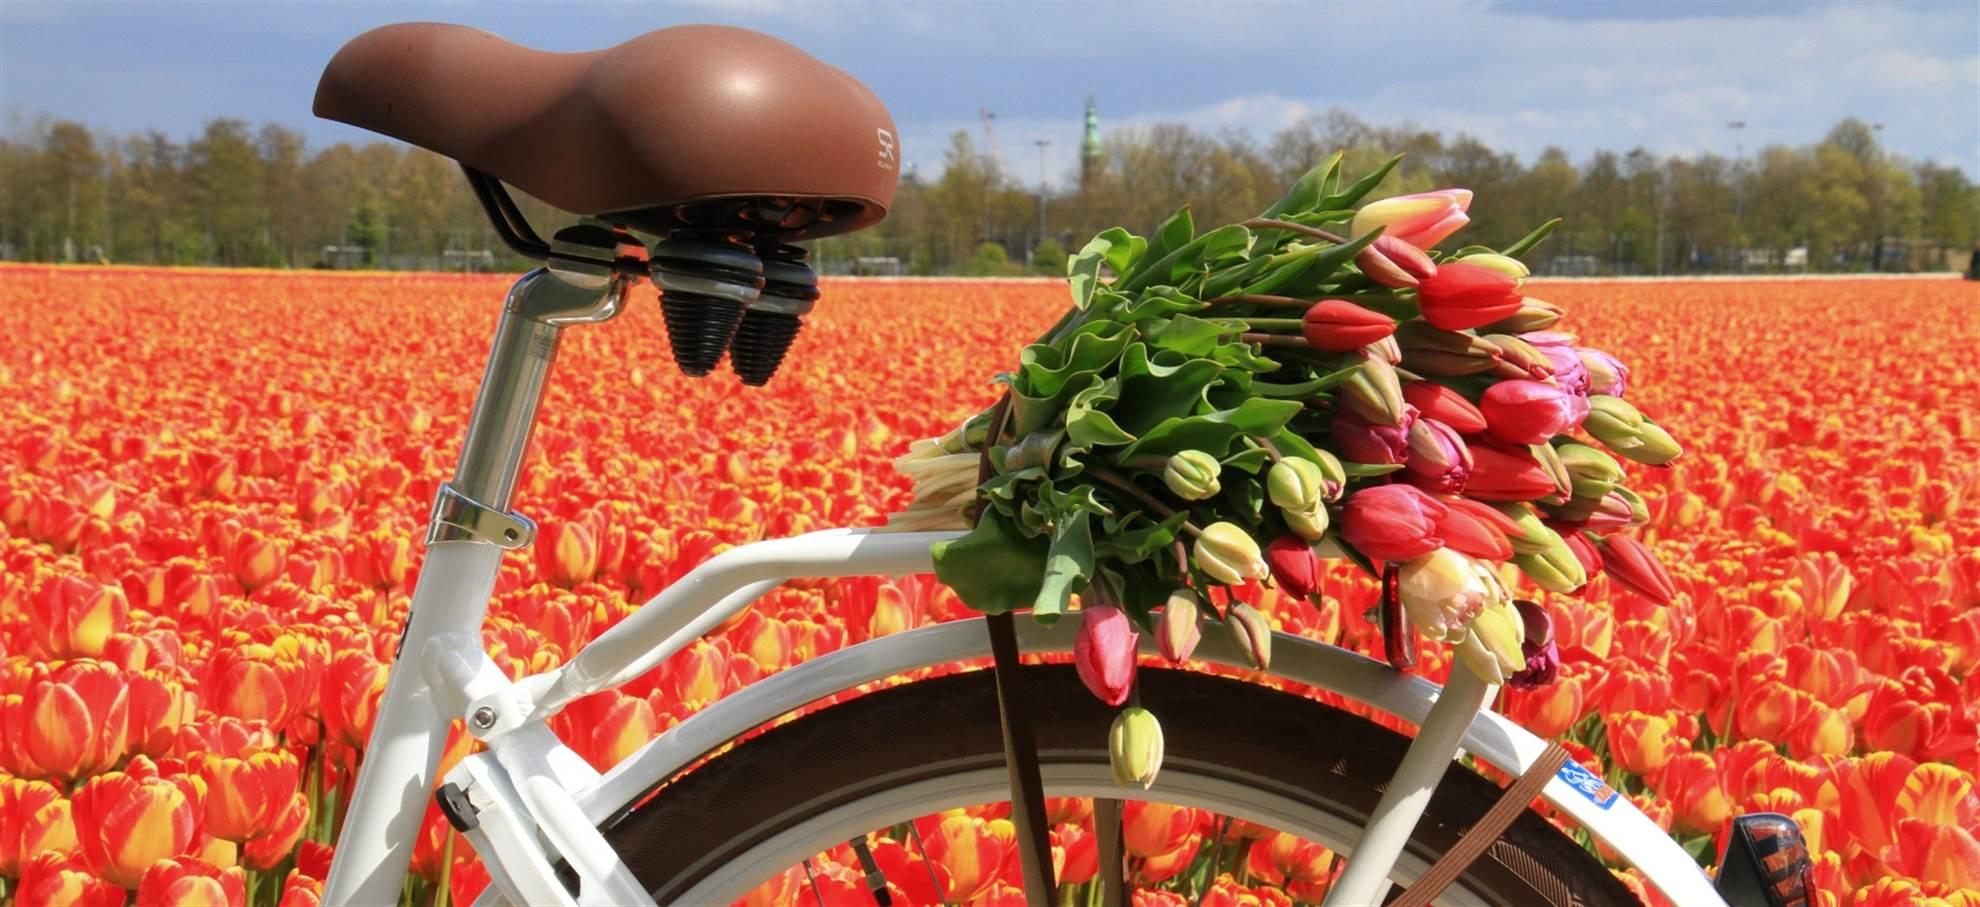 Aluguer de bicicletas em Lisse (Keukenhof) + audioguide Flowerfield